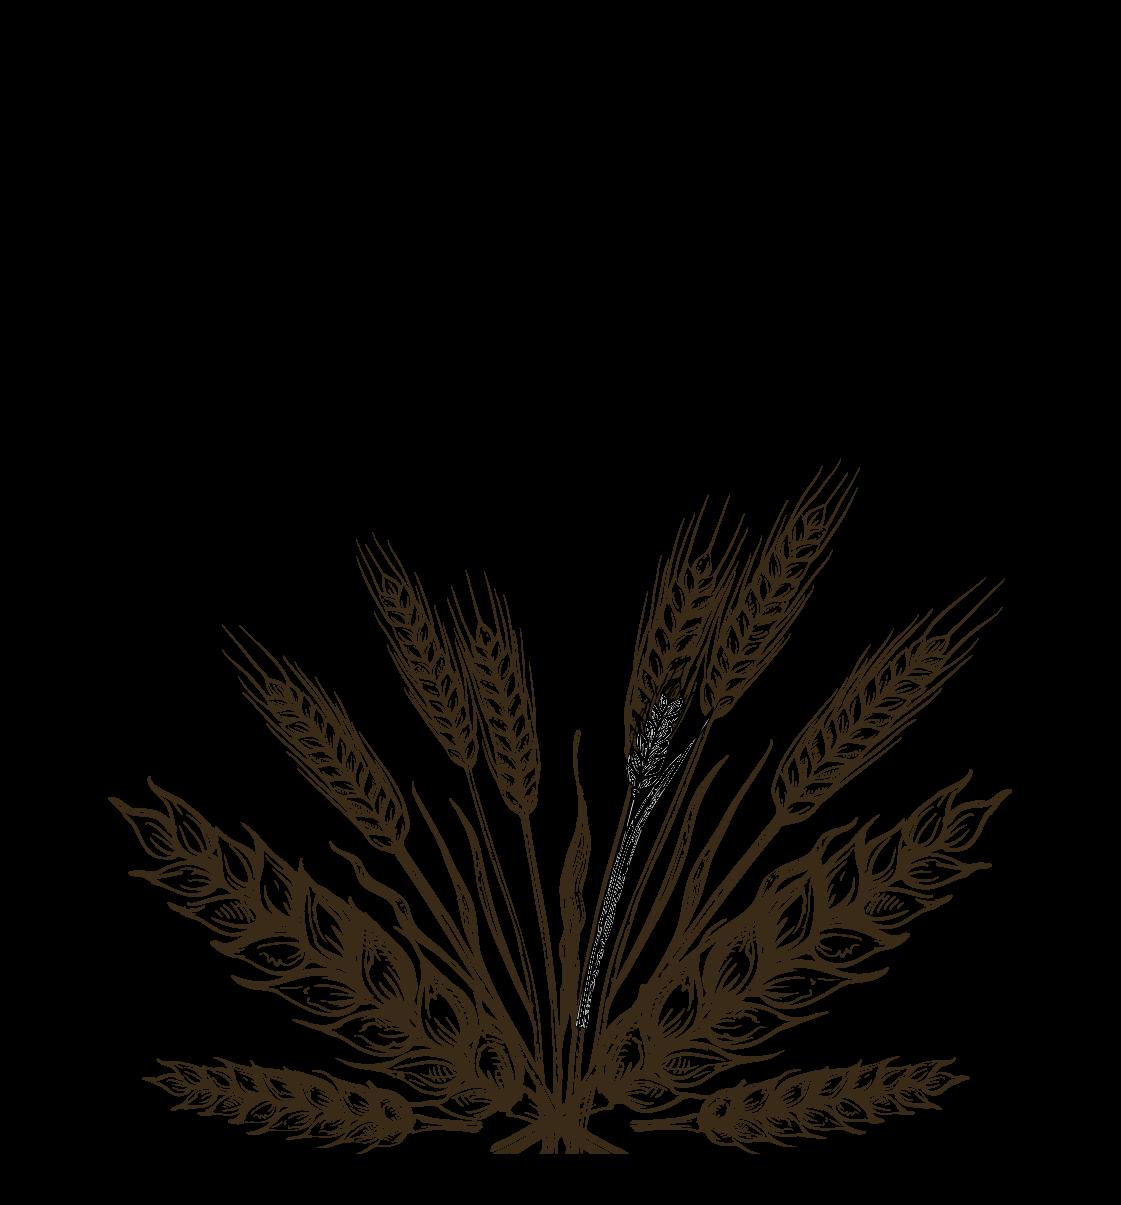 Grainshaker Wheat Vodka